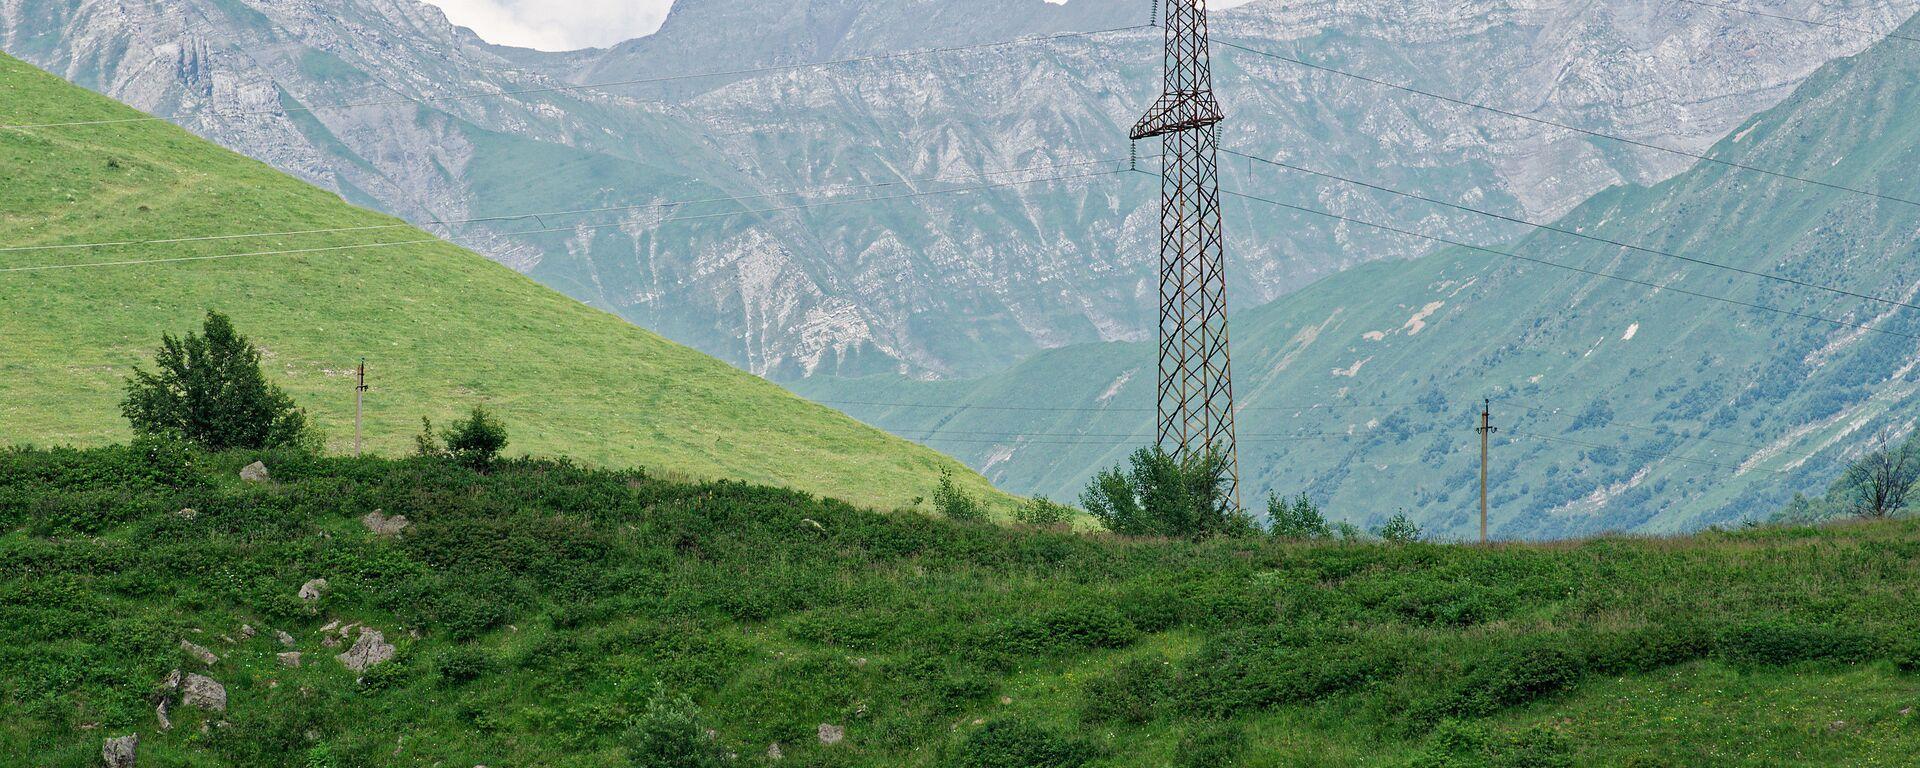 ЛЭП в горах близ Гудаури - Sputnik Грузия, 1920, 08.04.2021